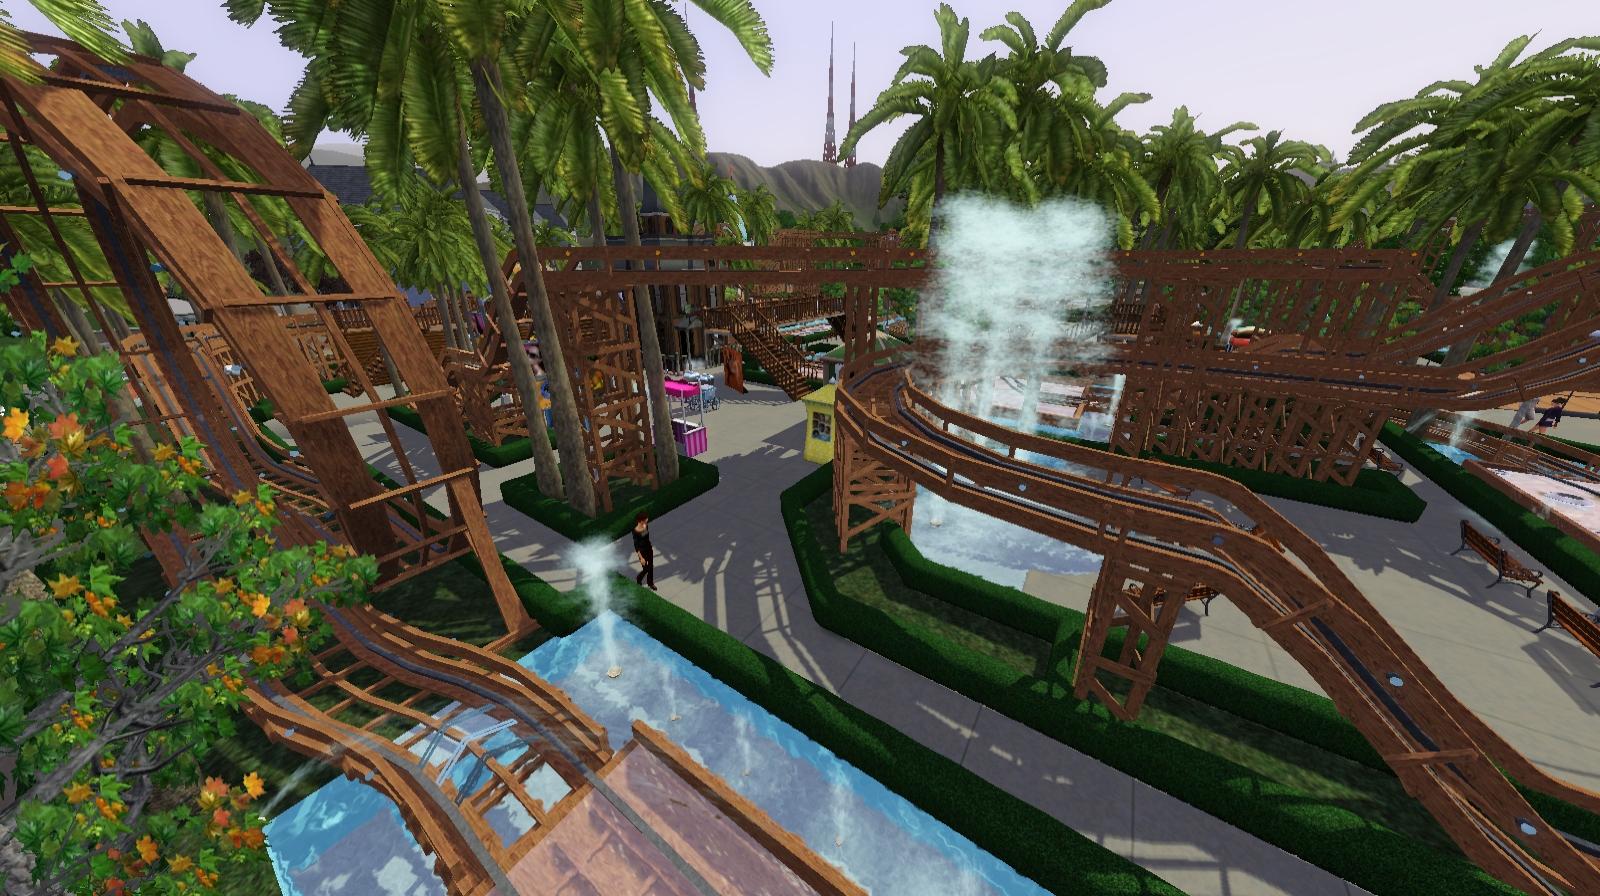 [Descarga] Parque Adventure Park. Screenshot-52